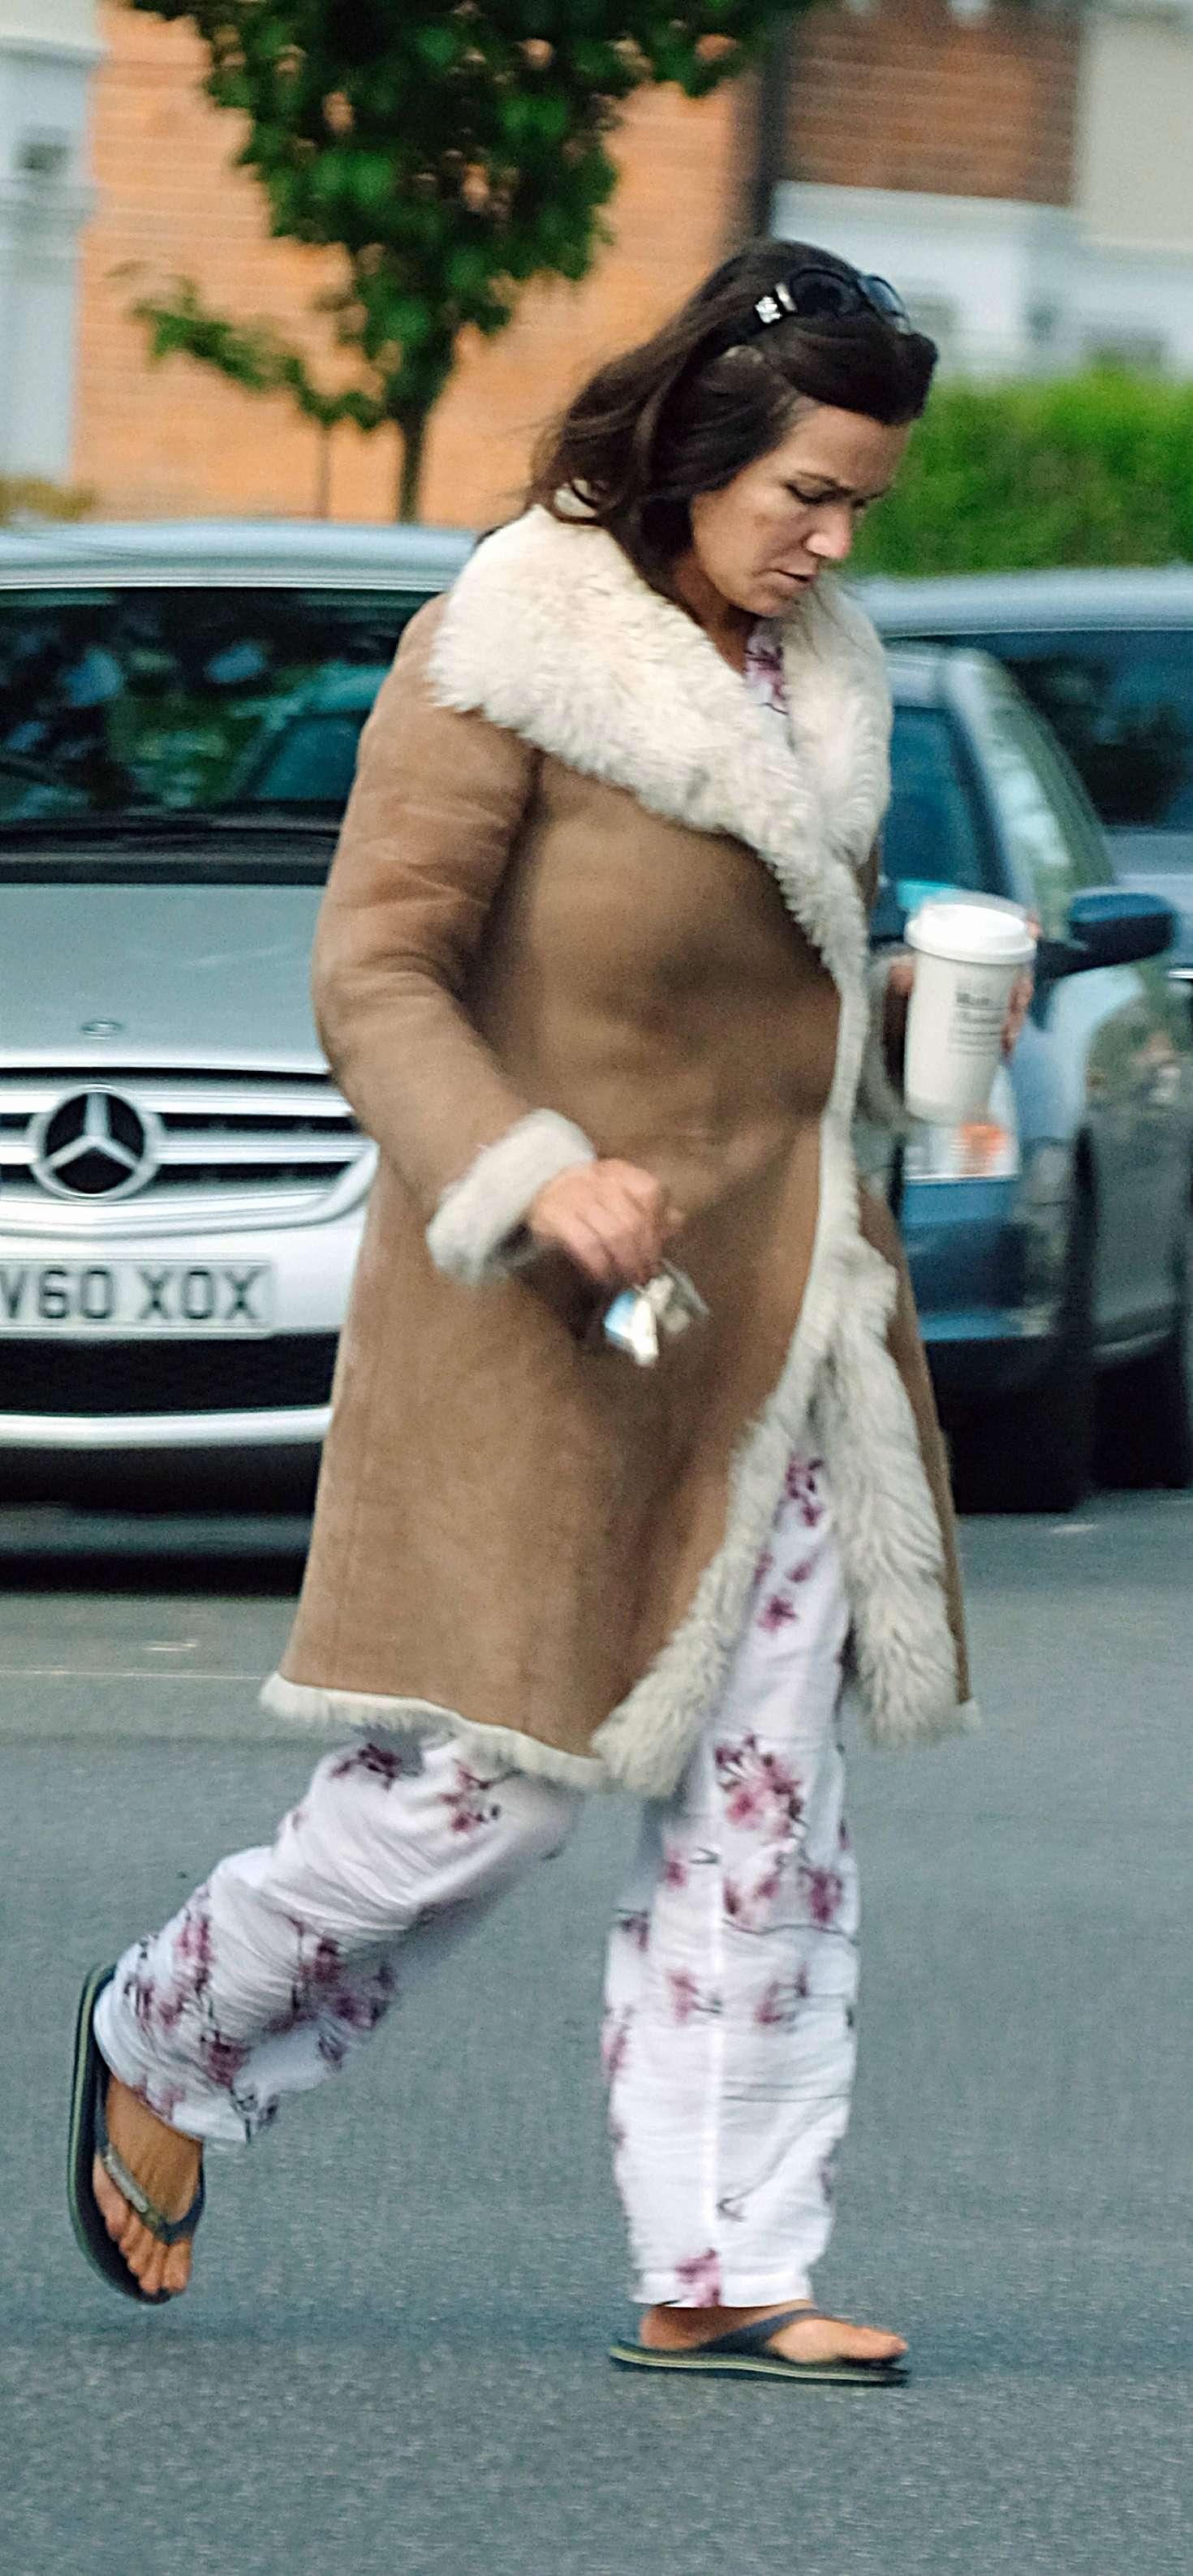 Susanna reid in her pyjamas out in london nudes (94 photo), Paparazzi Celebrity pics